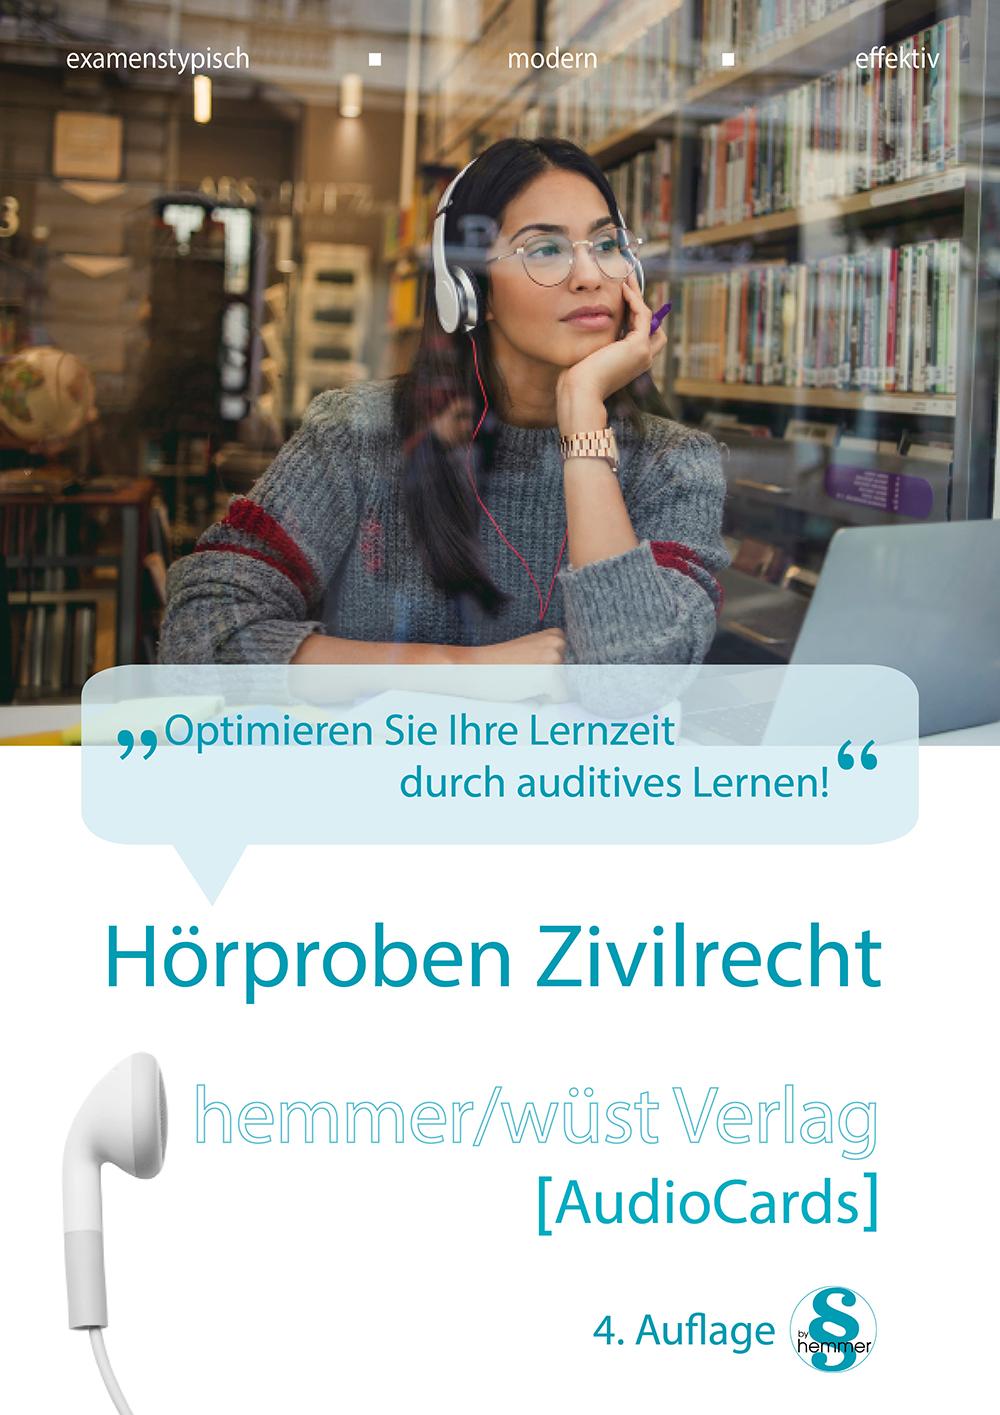 AudioCards Hörproben Zivilrecht